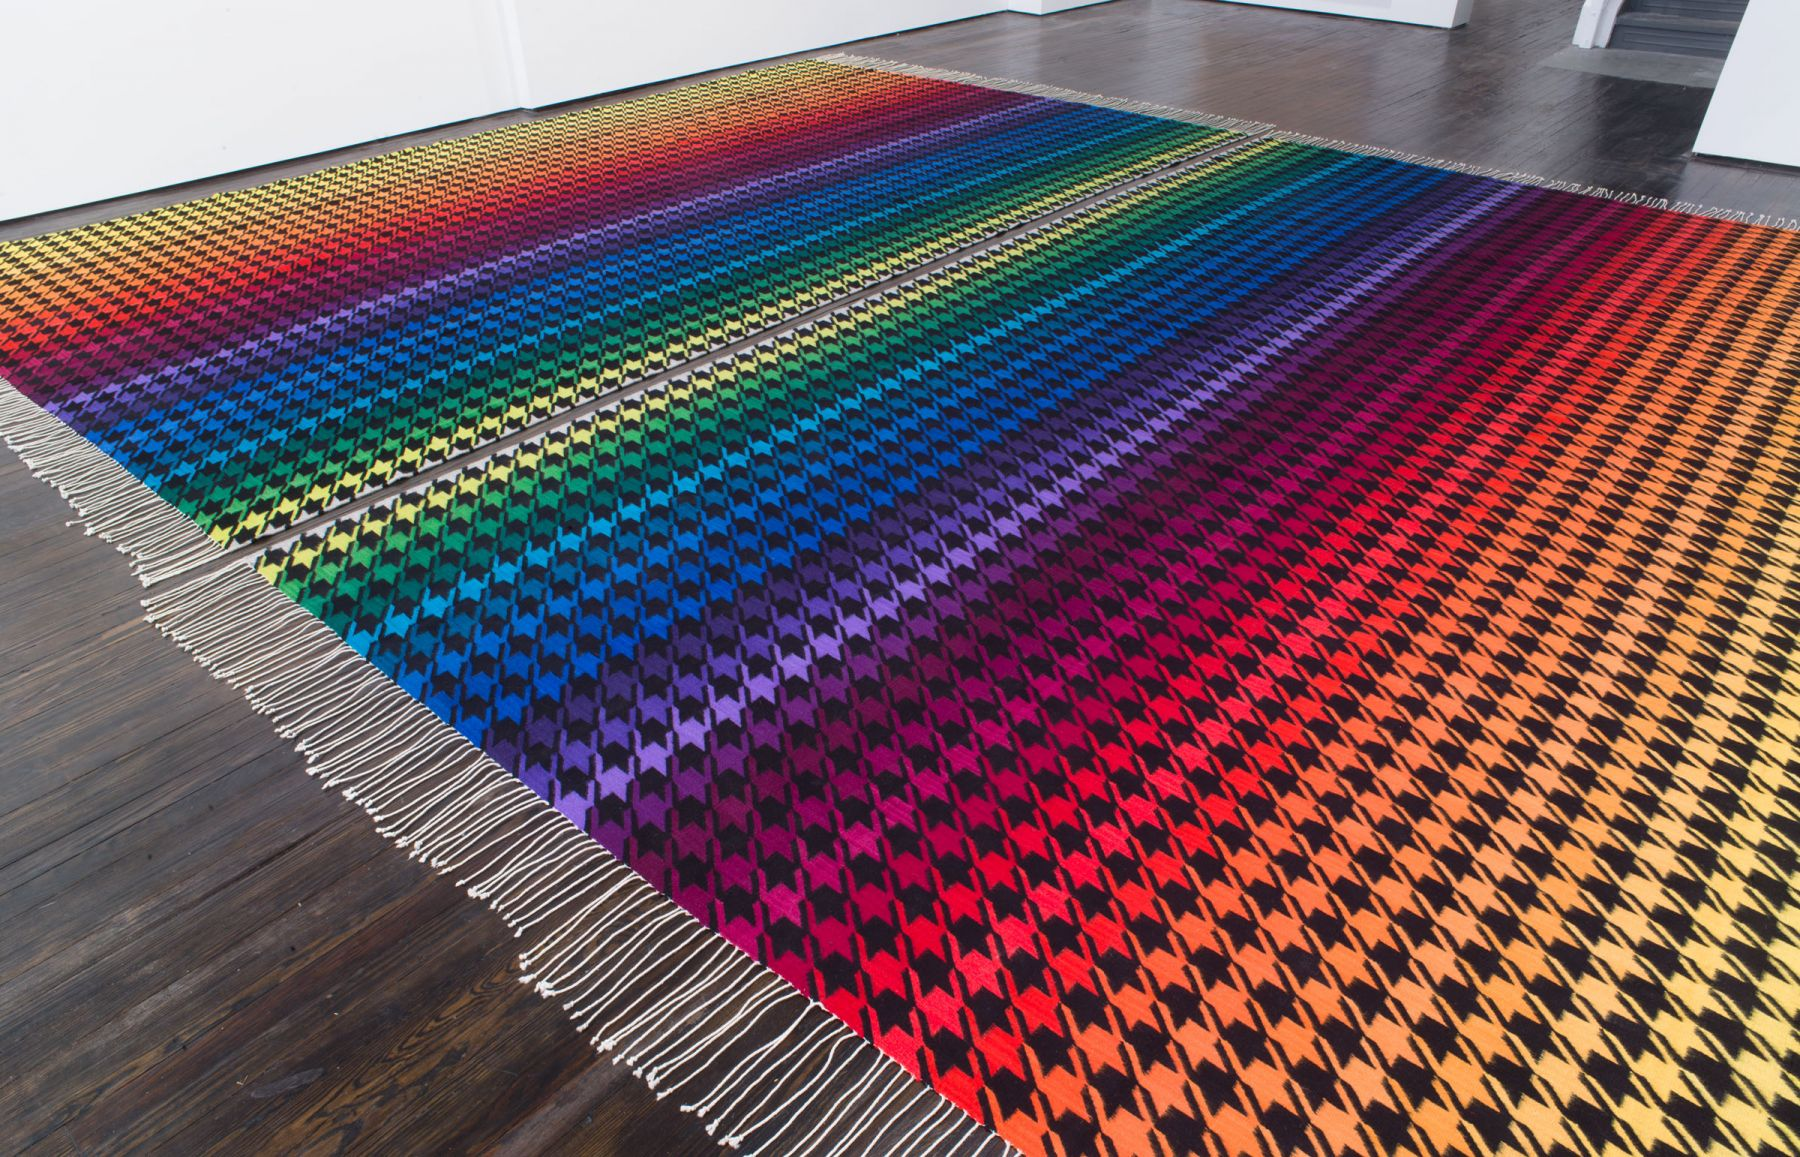 Polly Apfelbaum rug Locks gallery